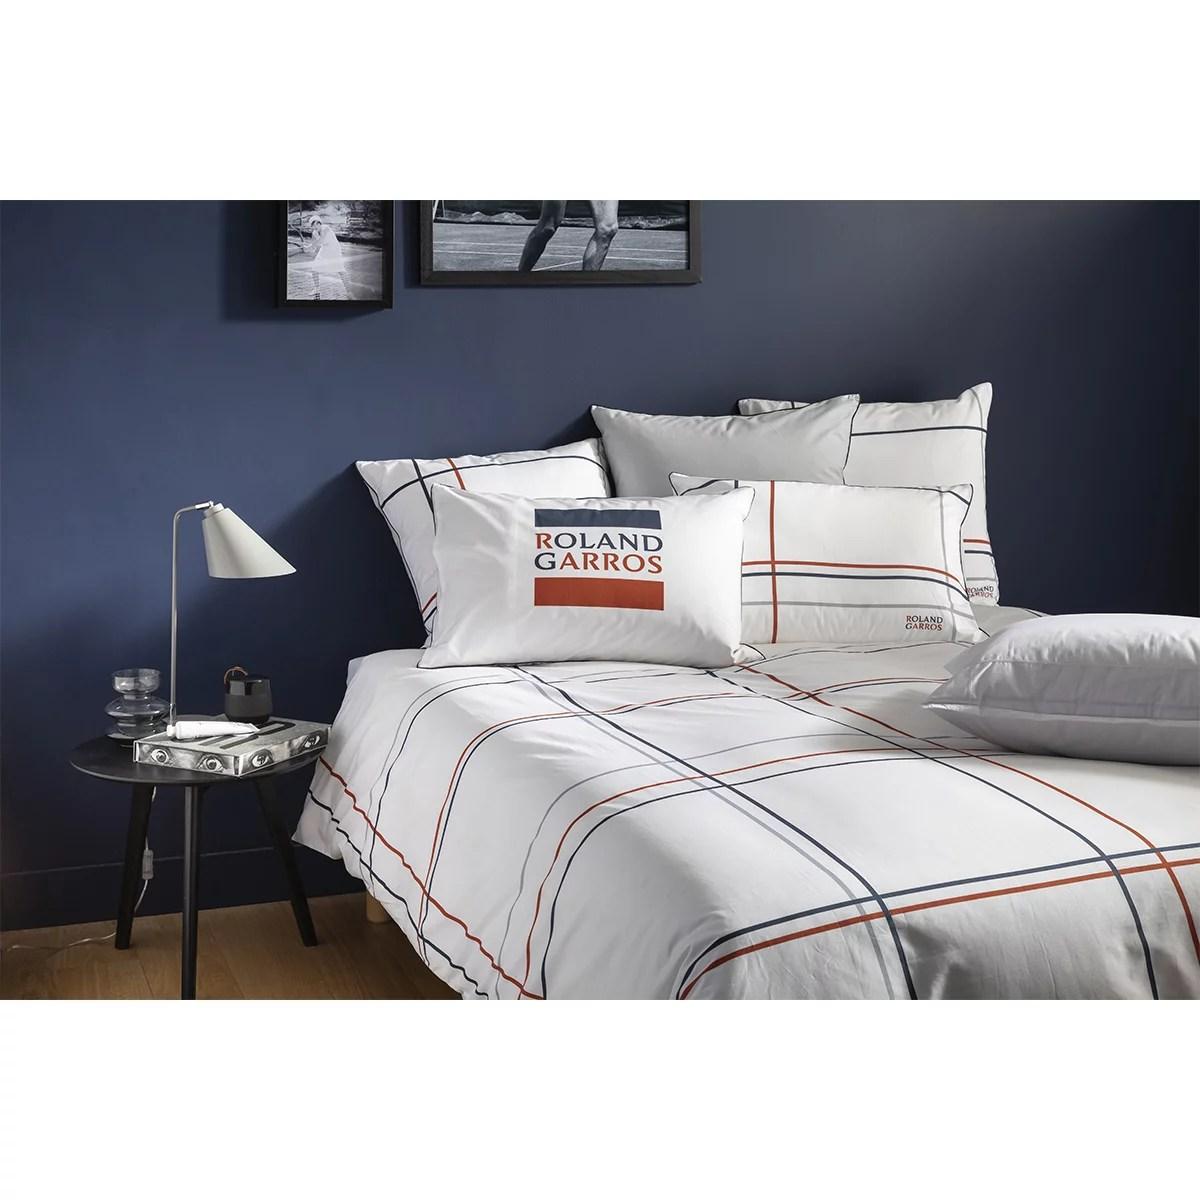 duvet cover chelem 240x220 in cotton percale carre blanc x roland garros mulitcolour